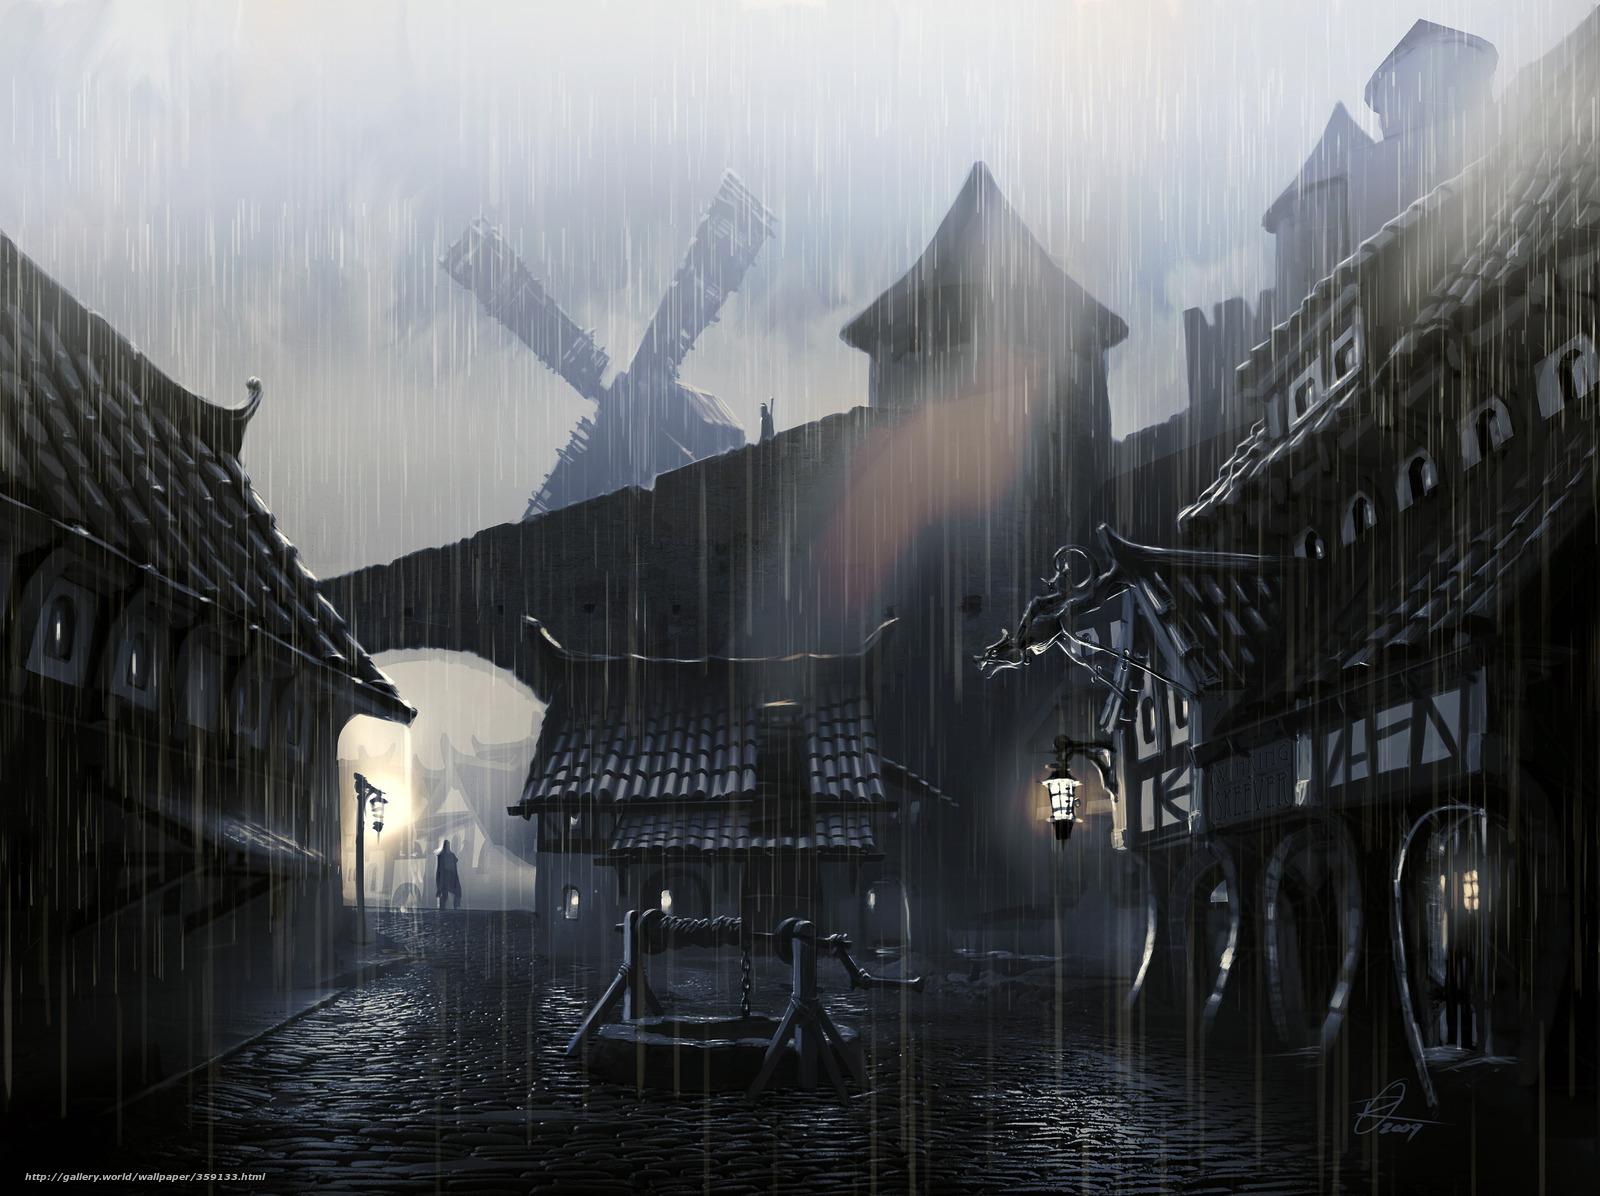 rain city wallpaper - photo #28